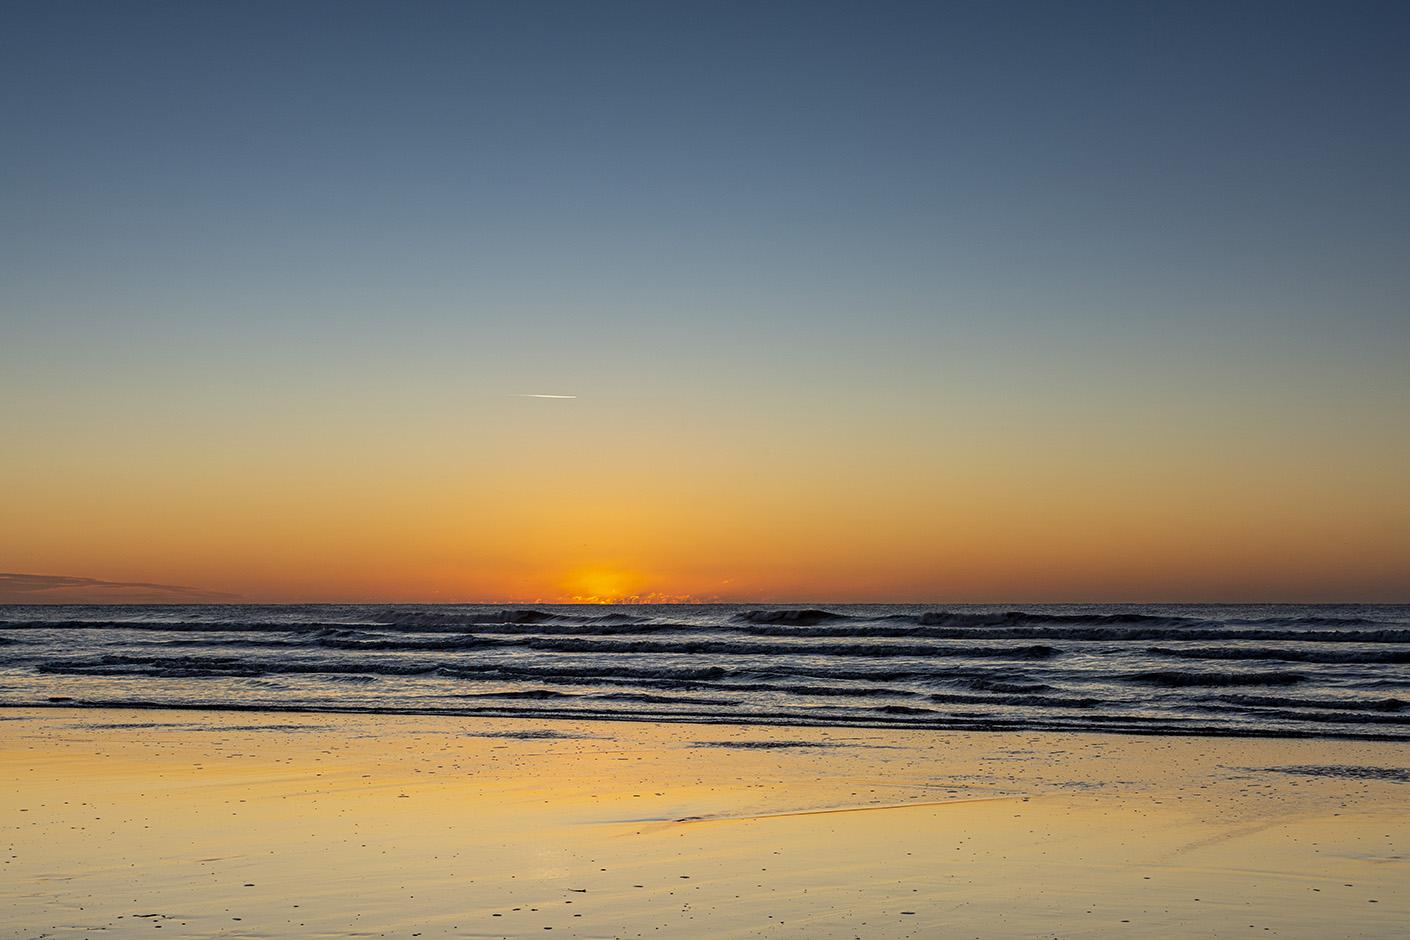 Blazing Horizon - Sandymouth